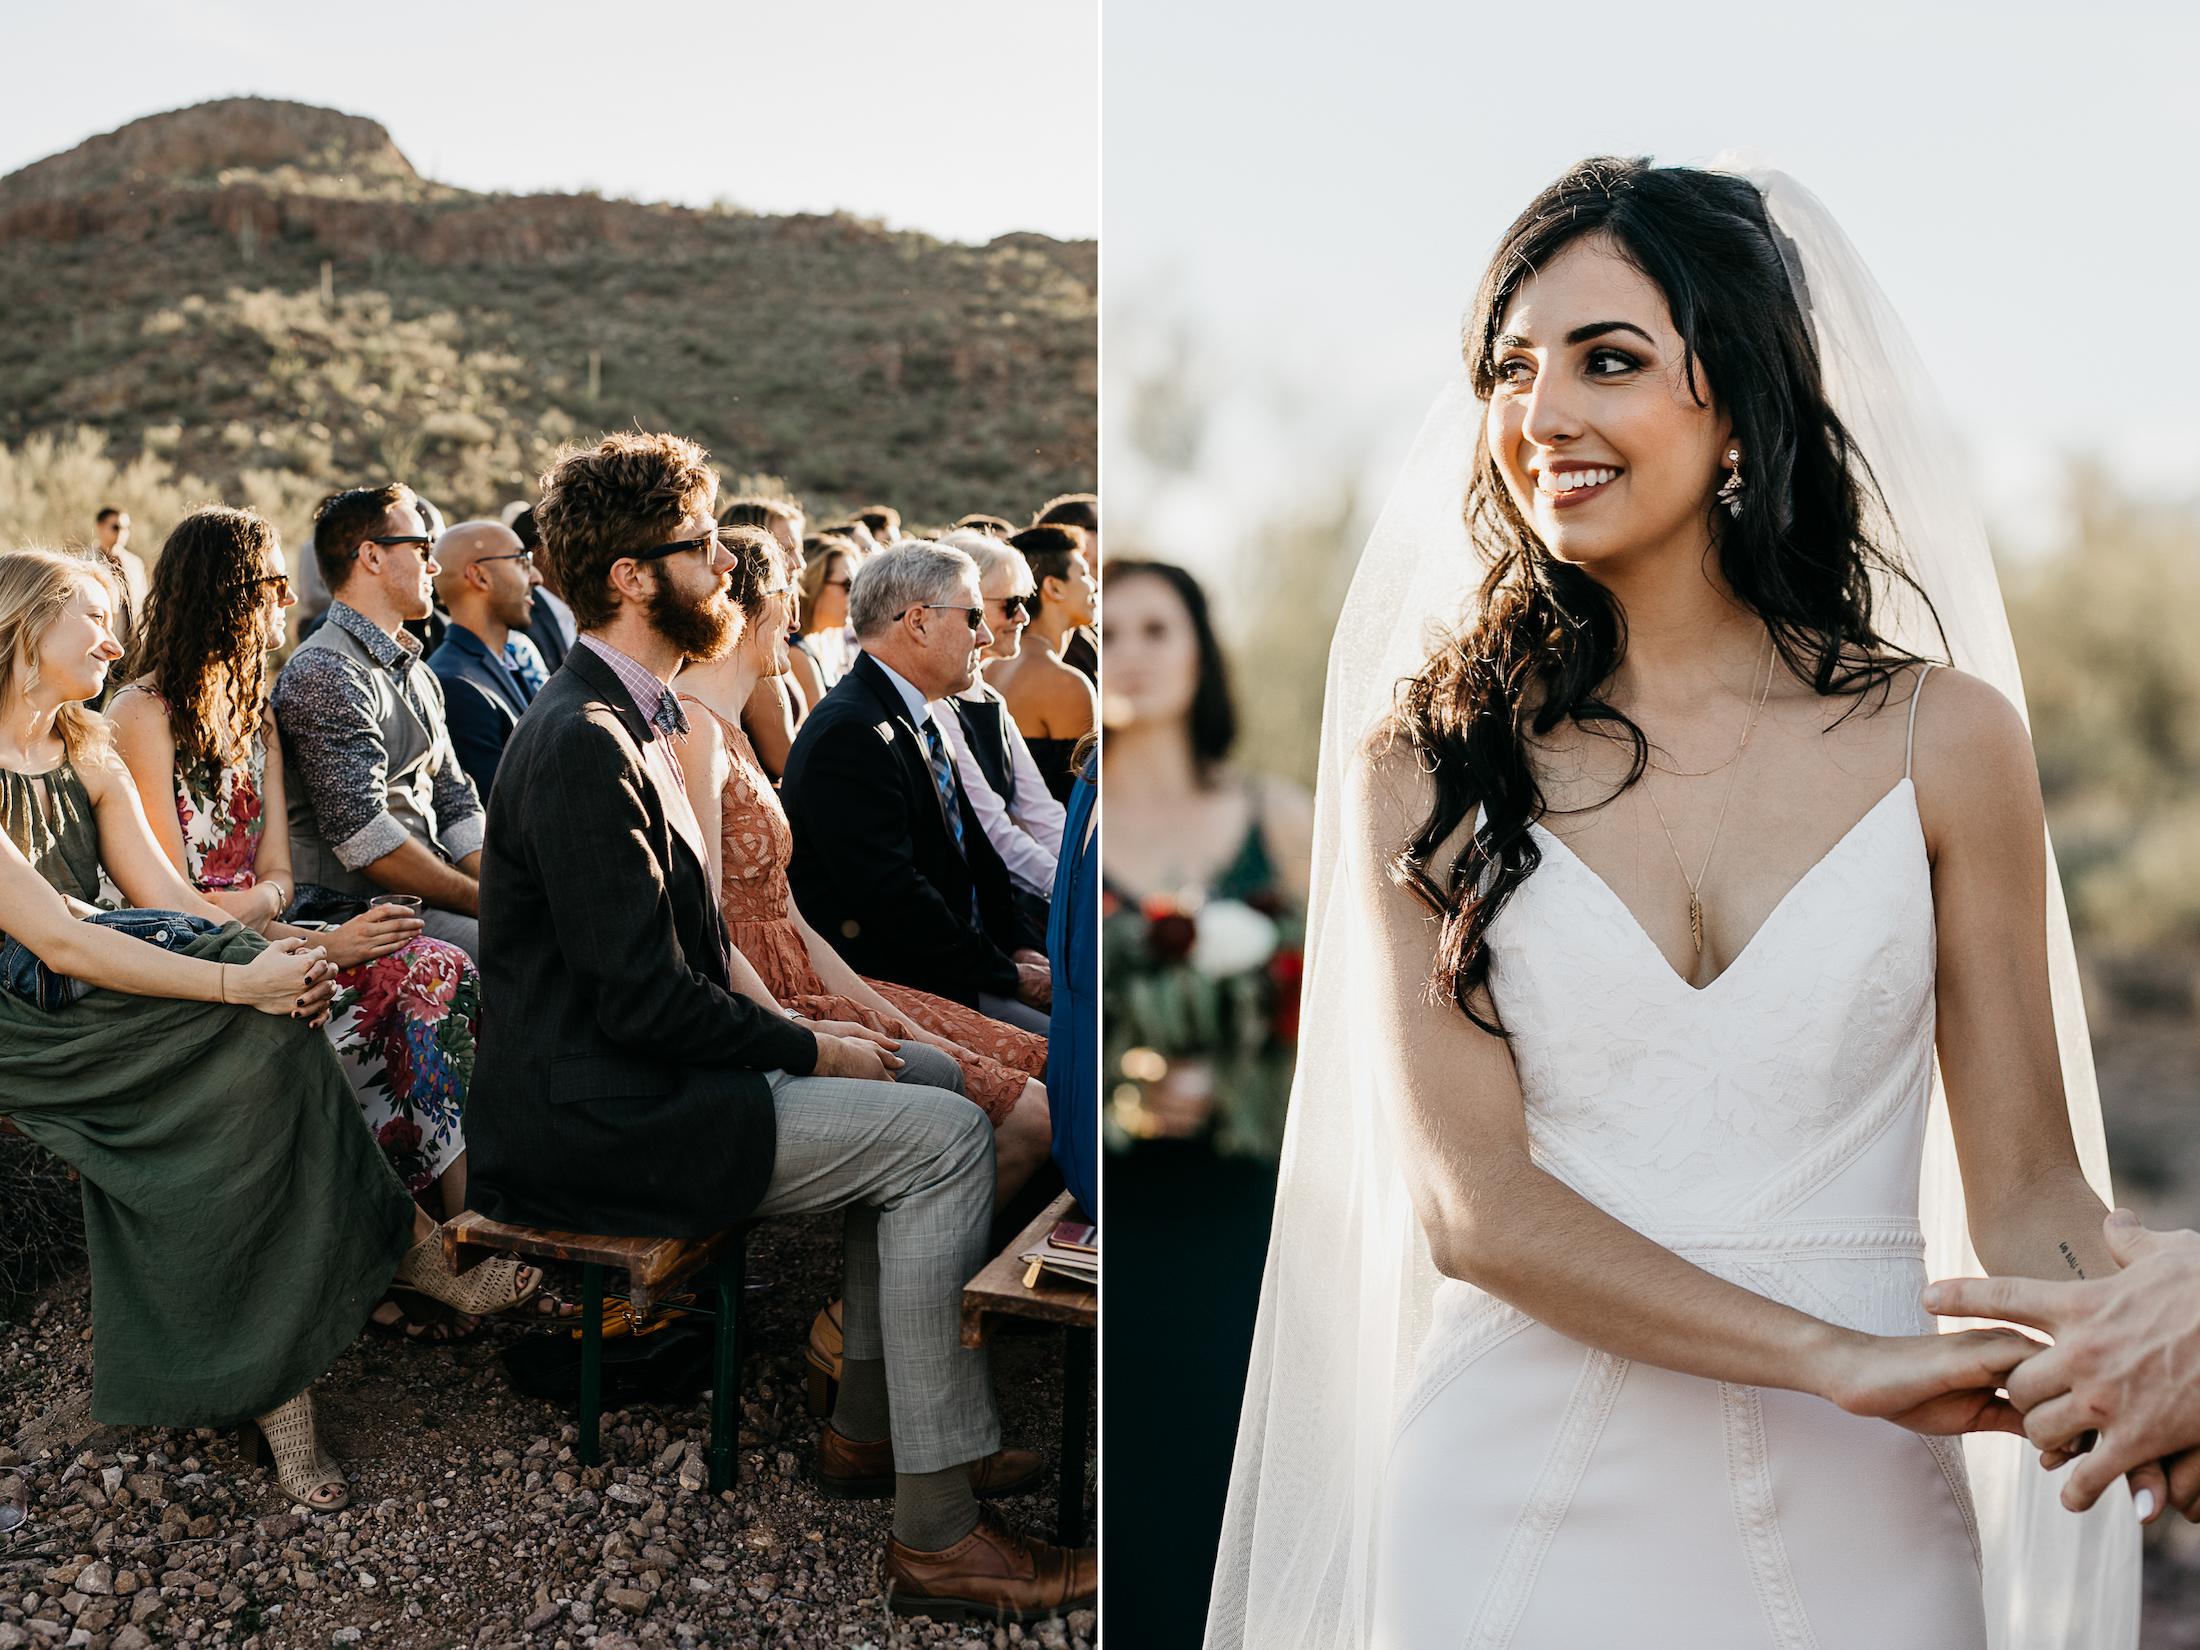 supersition-mountains-wedding-photography-arizona09.jpg